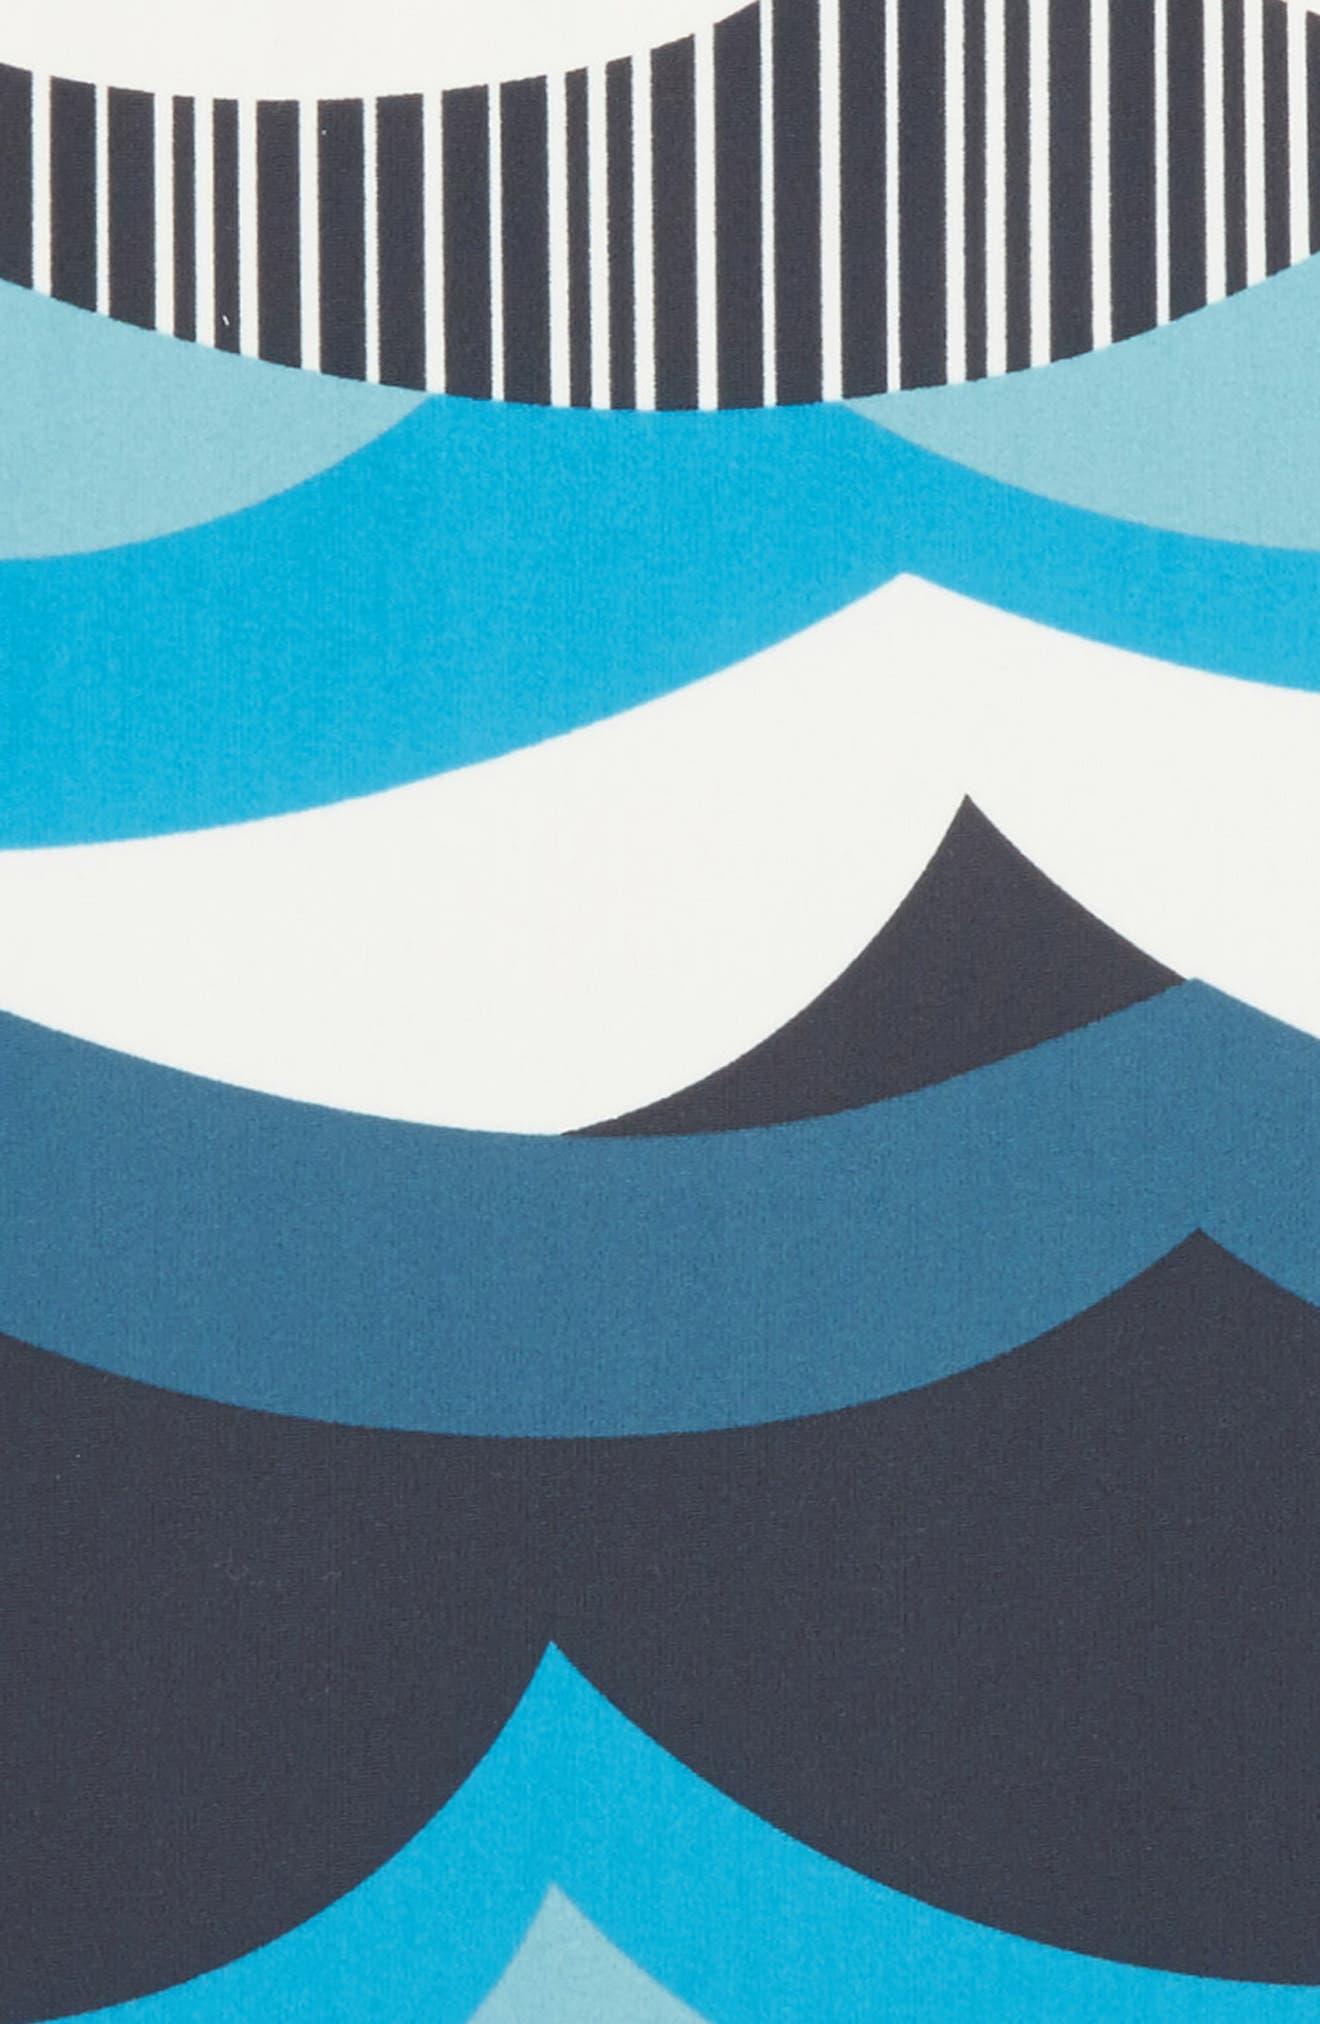 Make Waves One-Piece Swimsuit,                             Alternate thumbnail 2, color,                             Indigo